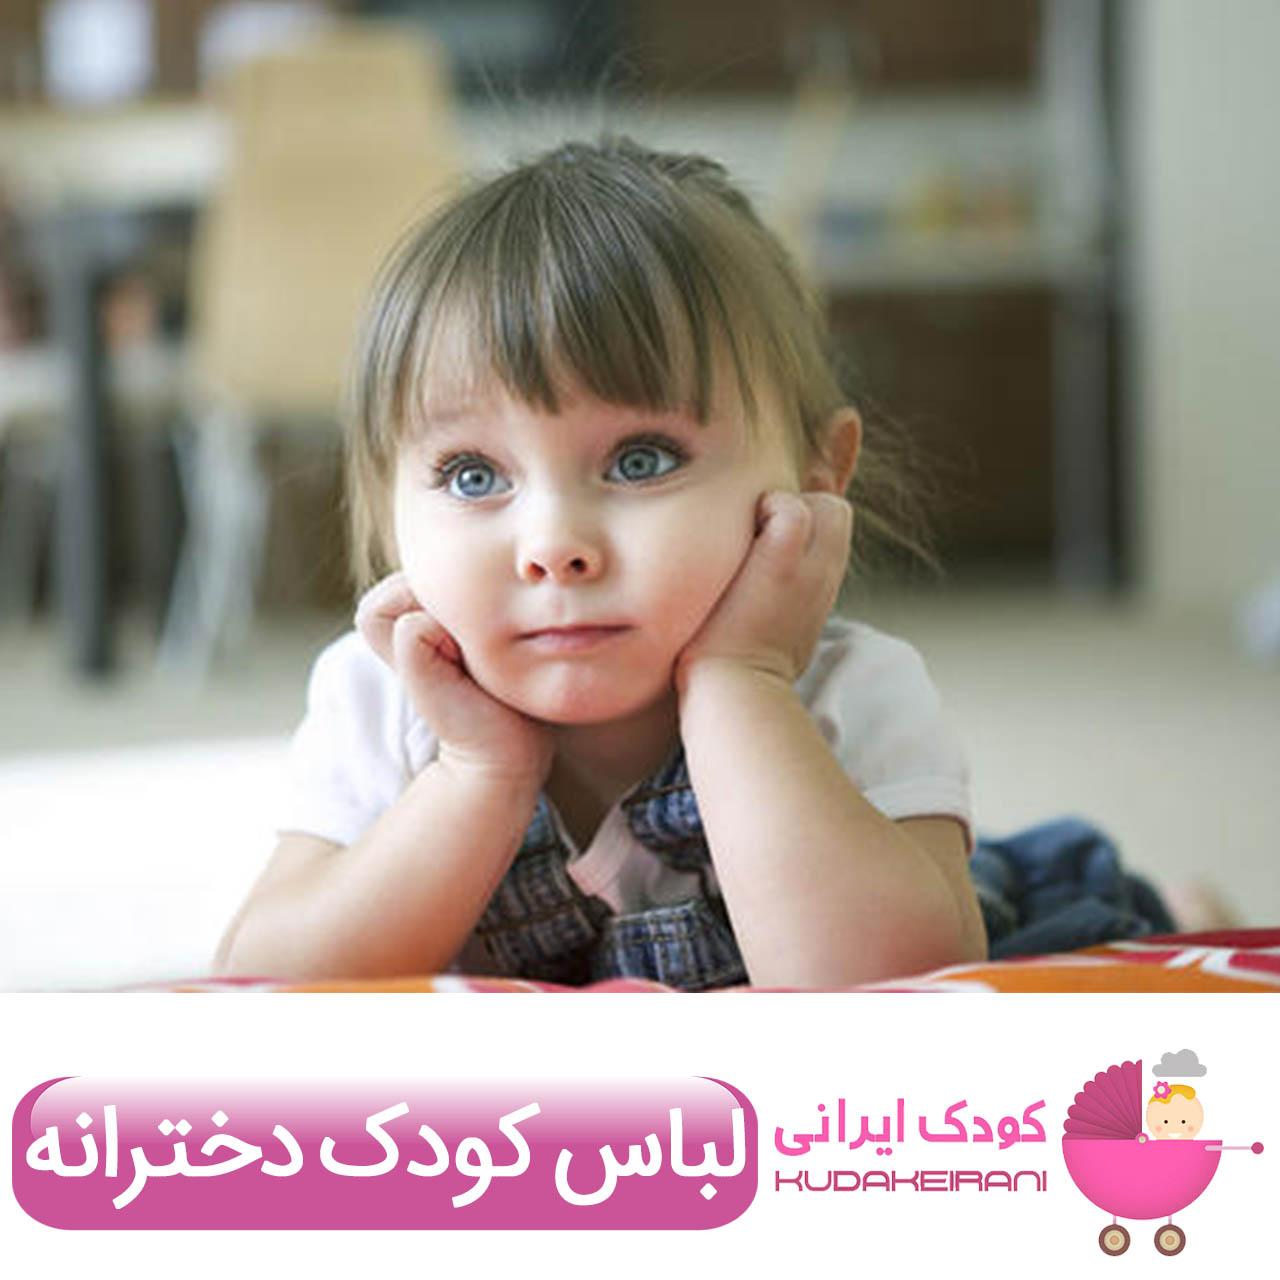 دامن پیشبندی بچه گانه پوشاک بچه گانه | لباس کودک ایرانی | لباس نوزاد | سیسمونی